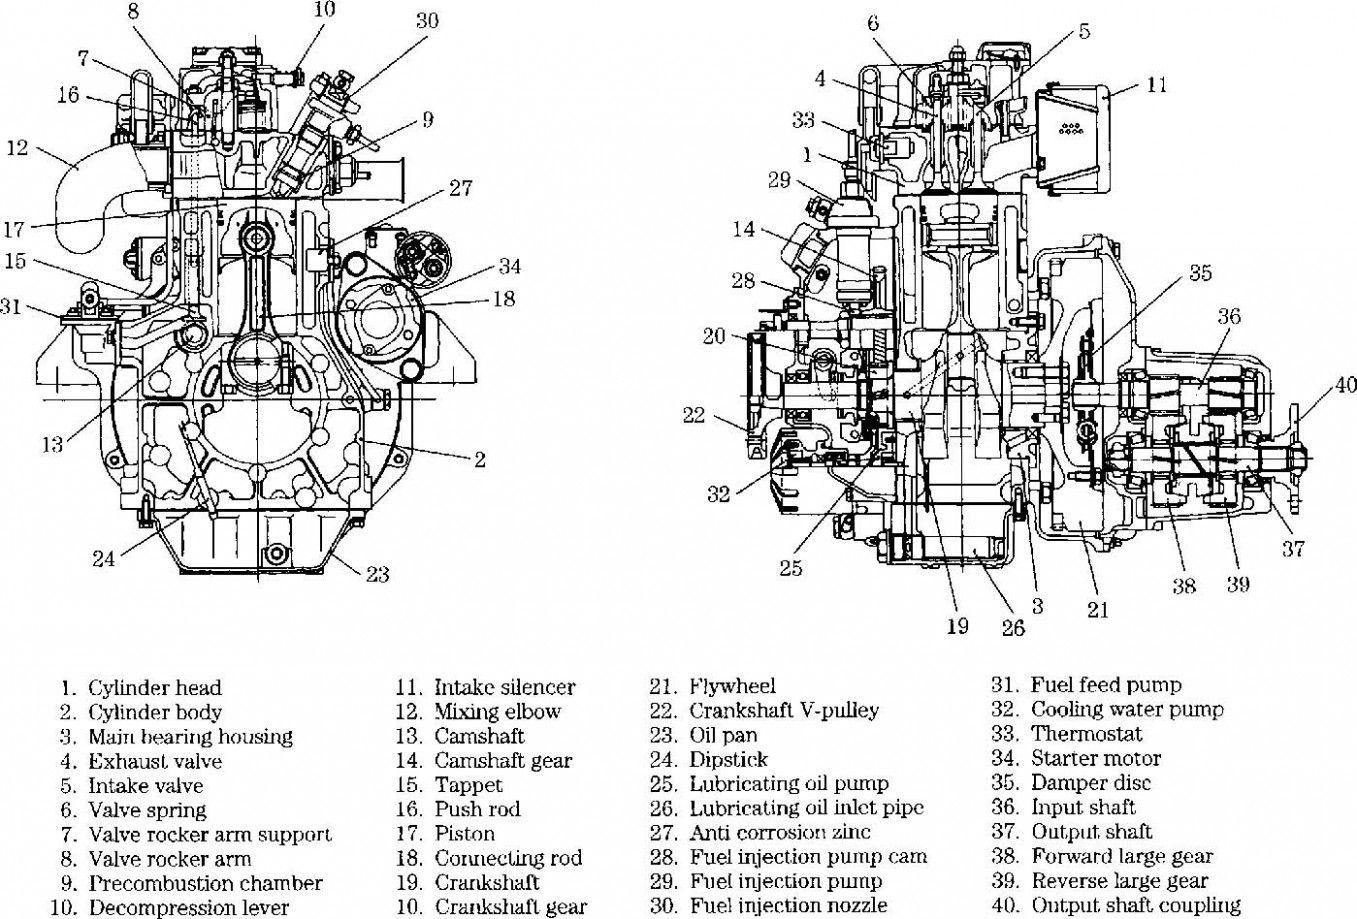 Internal Combustion Engine Block Diagram In